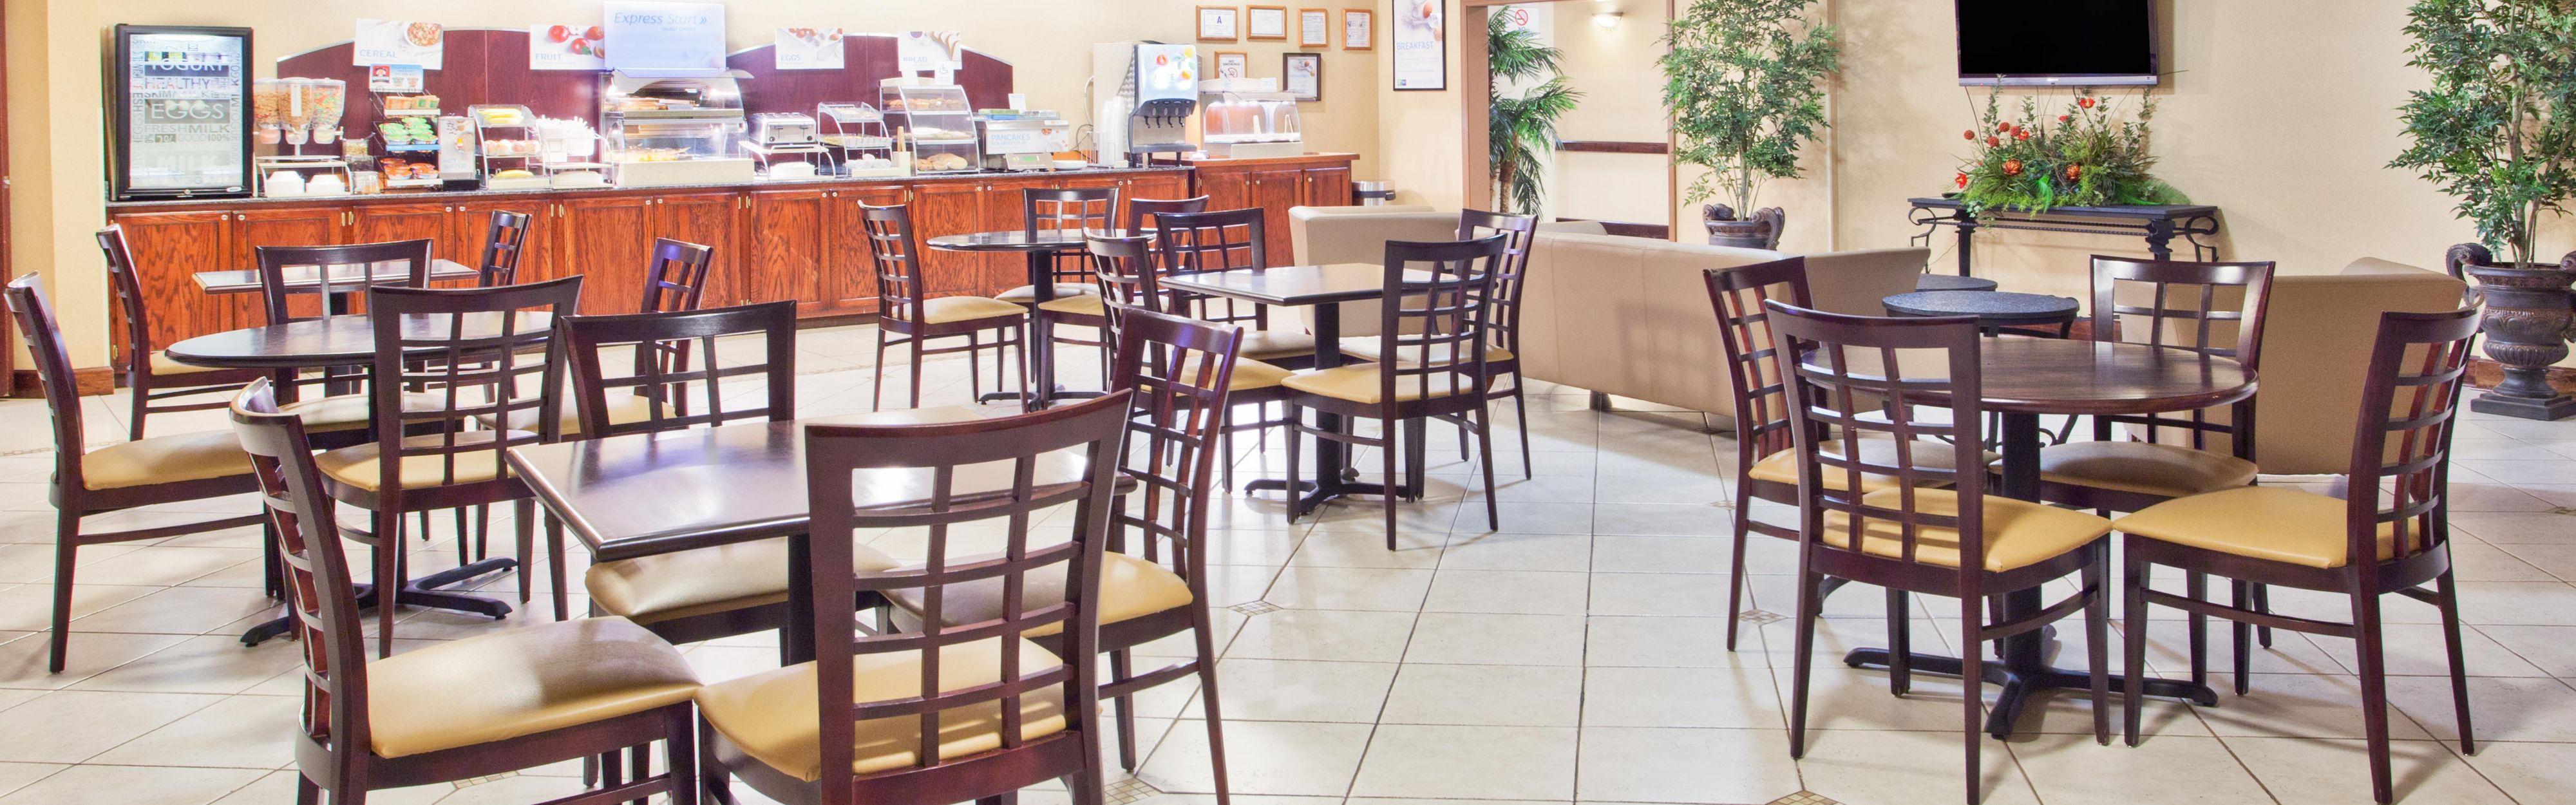 Holiday Inn Express & Suites Douglas image 3